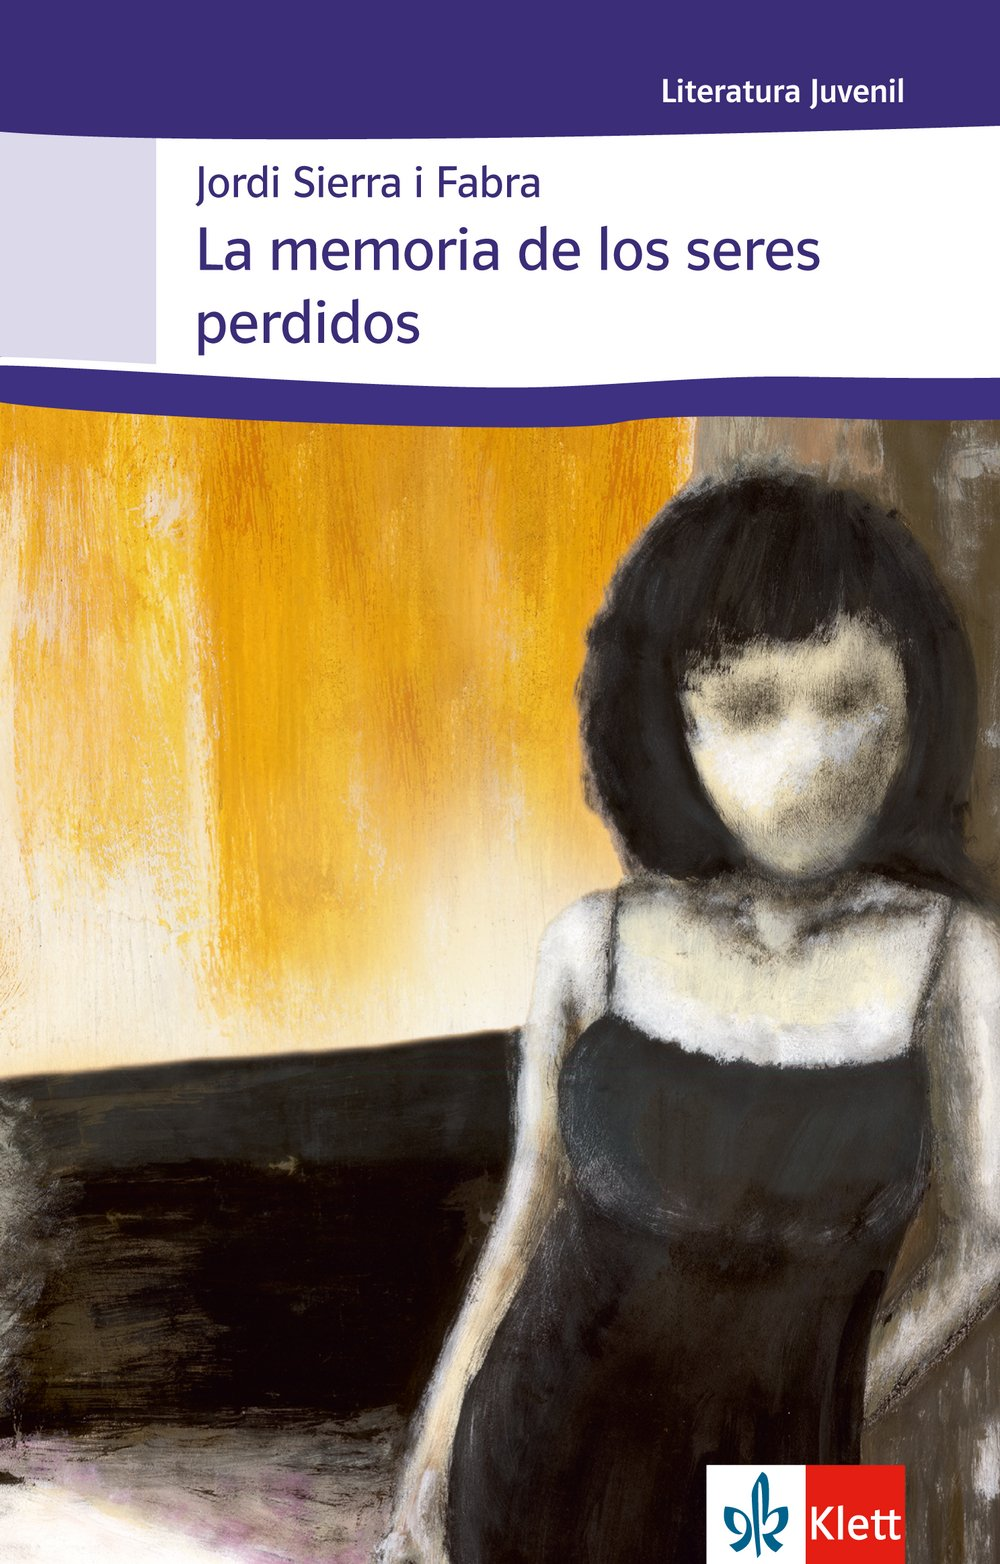 La memoria de los seres perdidos: Schulausgabe für das Niveau B1+. Spanischer Originaltext mit Annotationen (Literatura Juvenil)